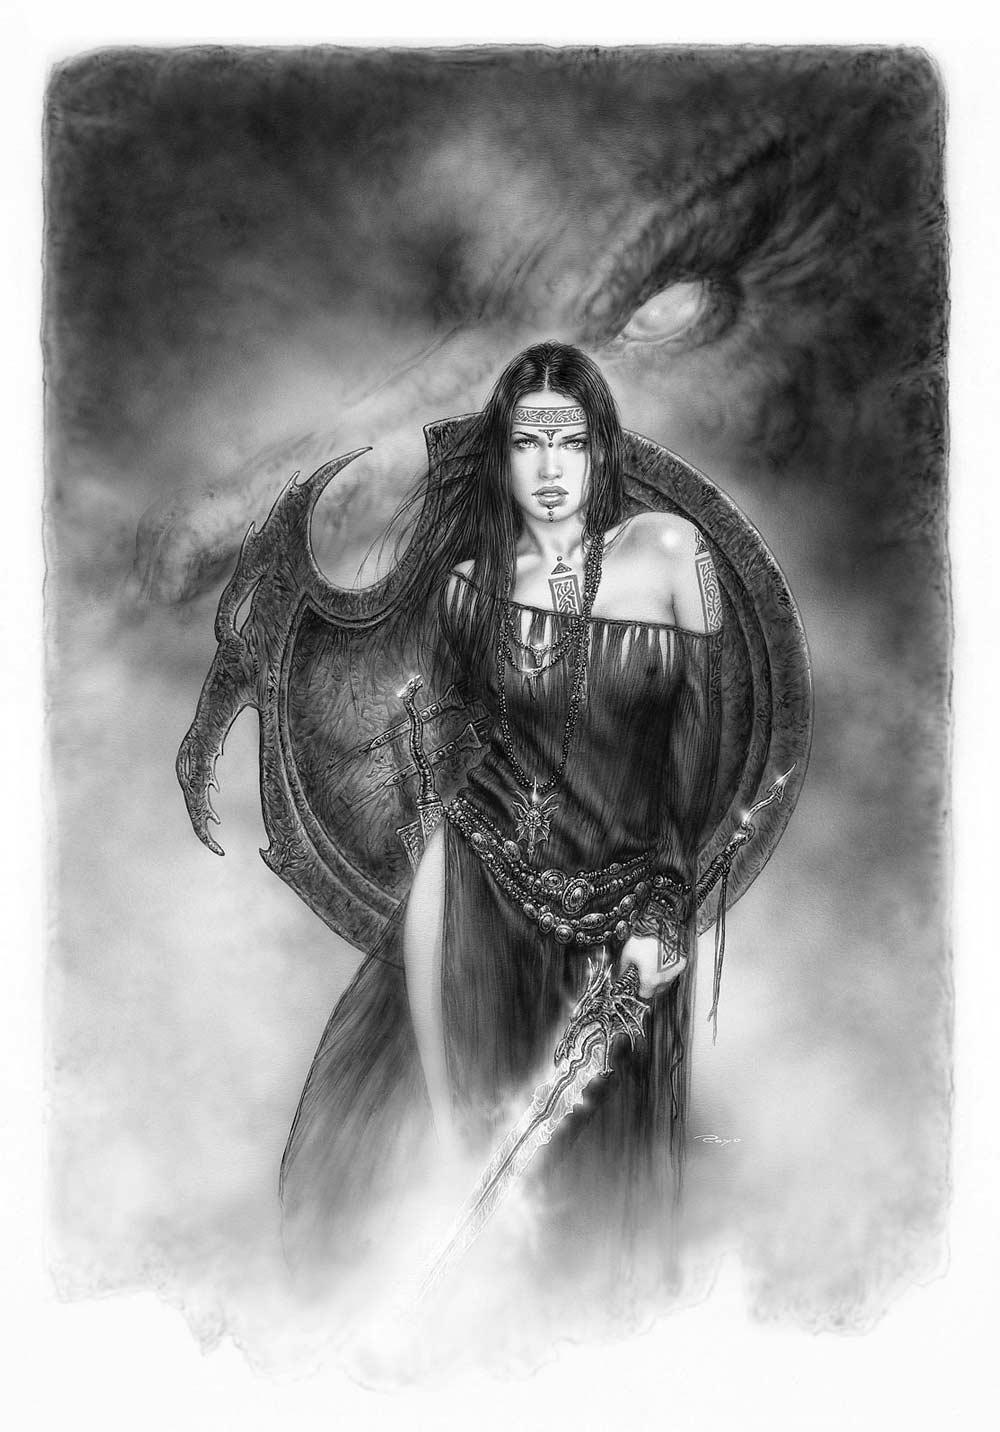 LuisRoyo-Ref_18426-The_Guardian_of_the_Black_Dragon